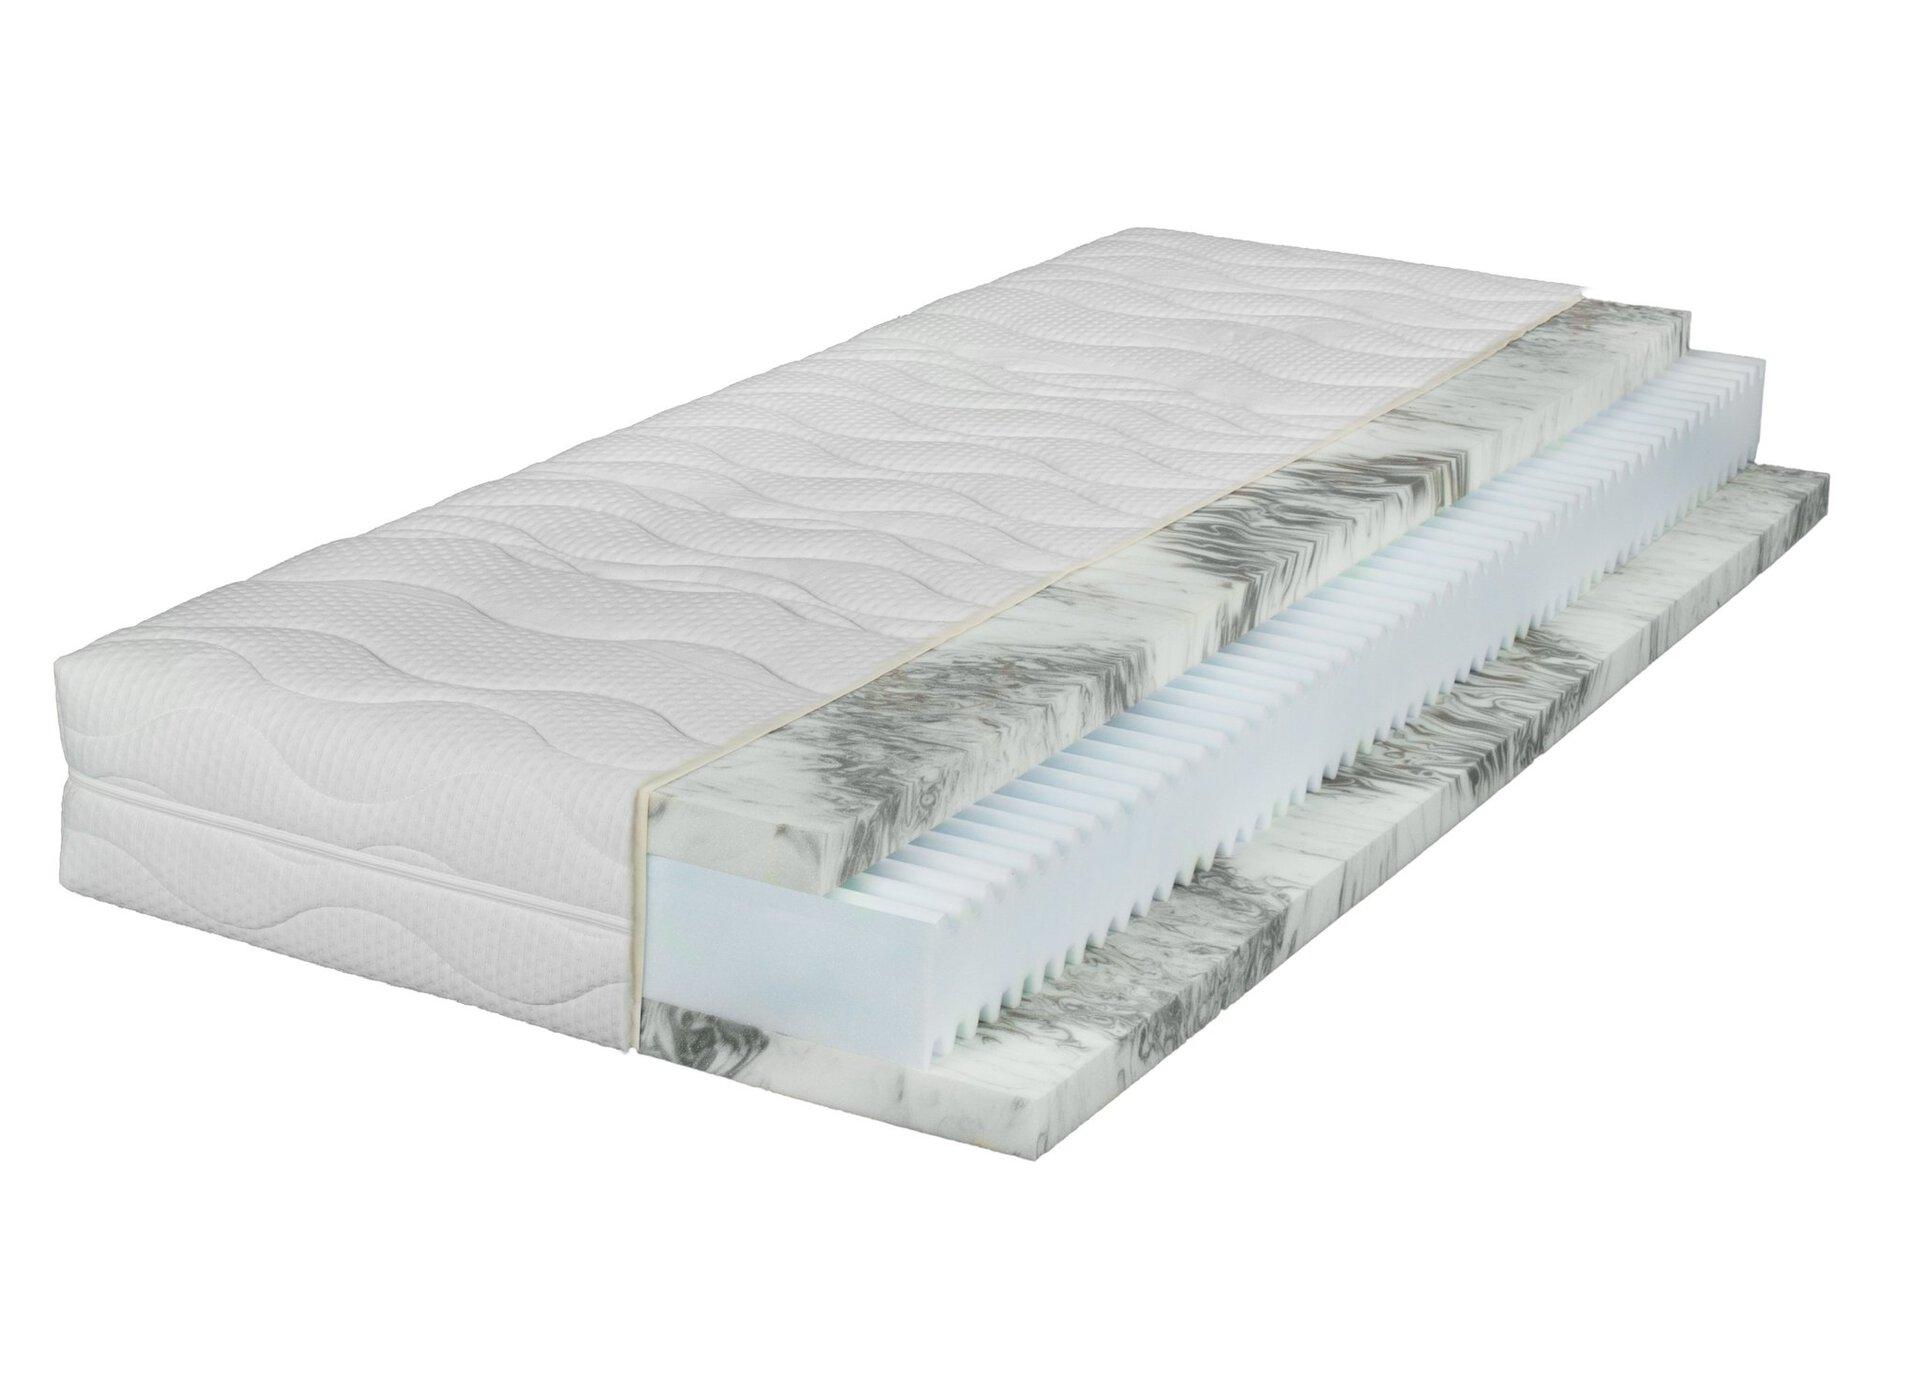 Matratze BELLINZONA LIV'IN LIV'IN Textil weiß 200 x 23 x 90 cm